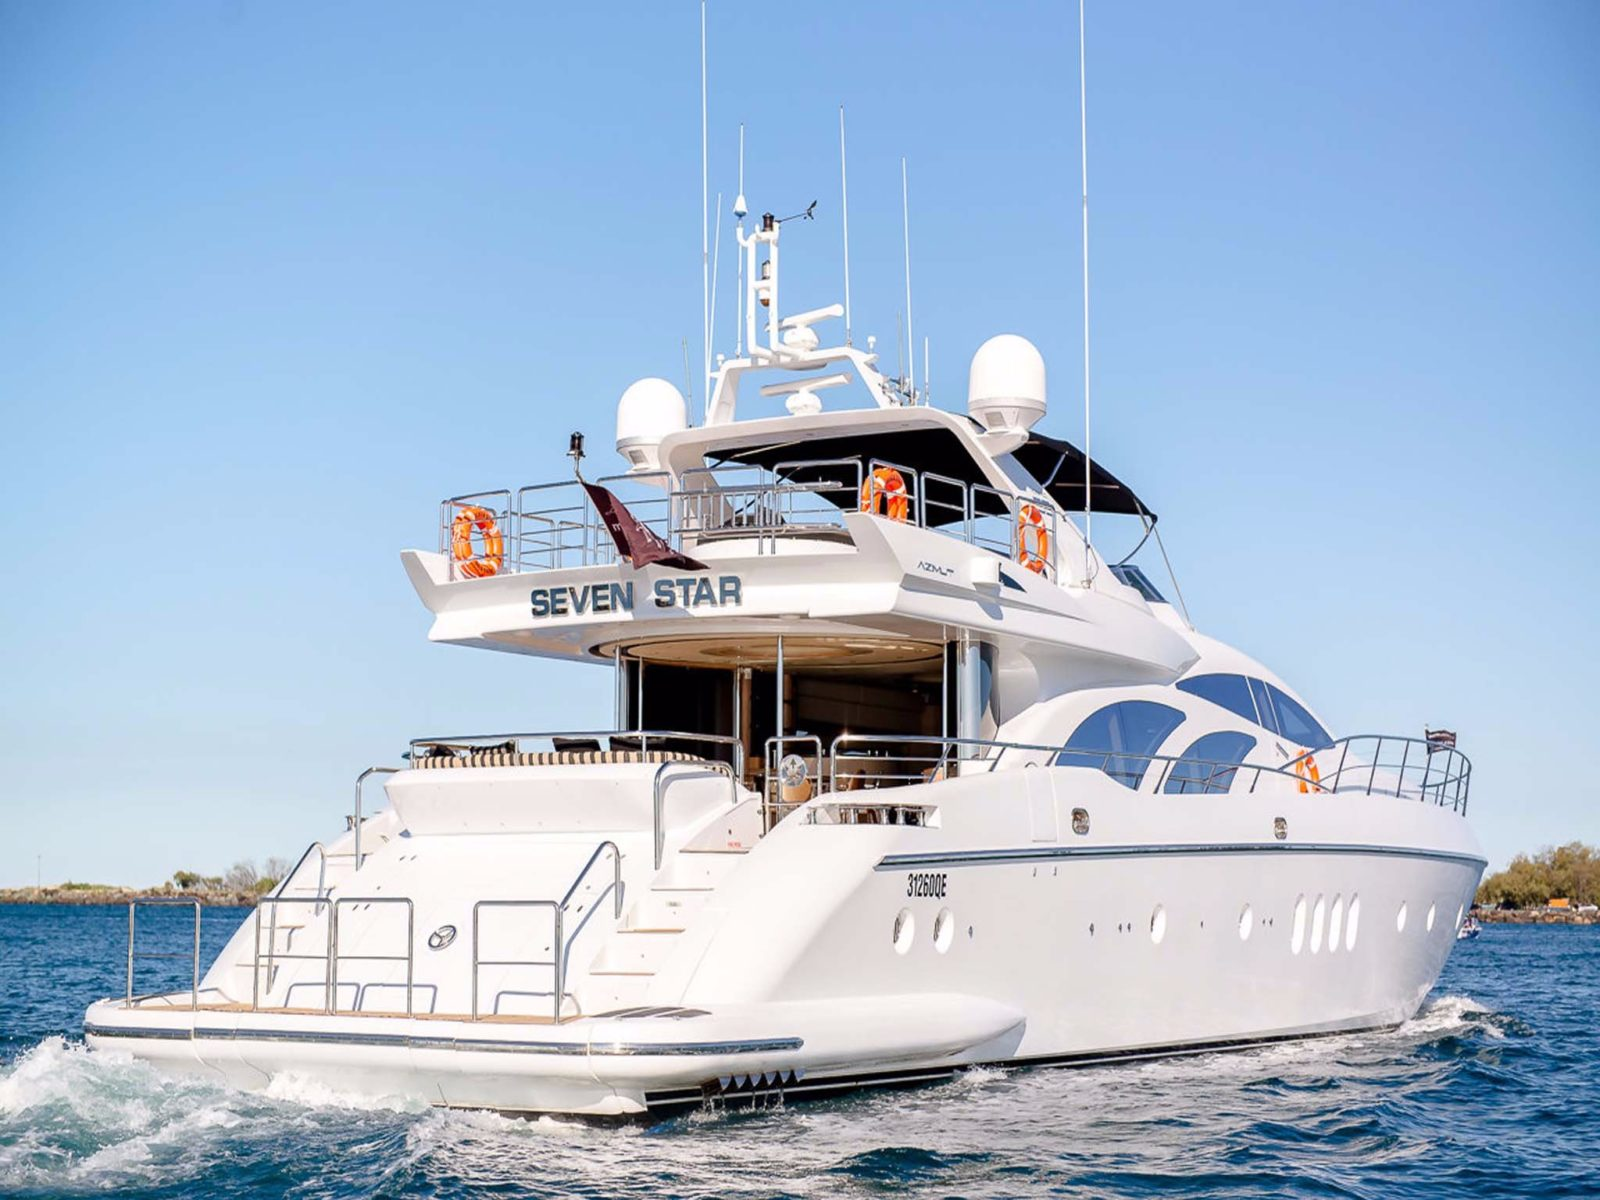 98 foot super yacht